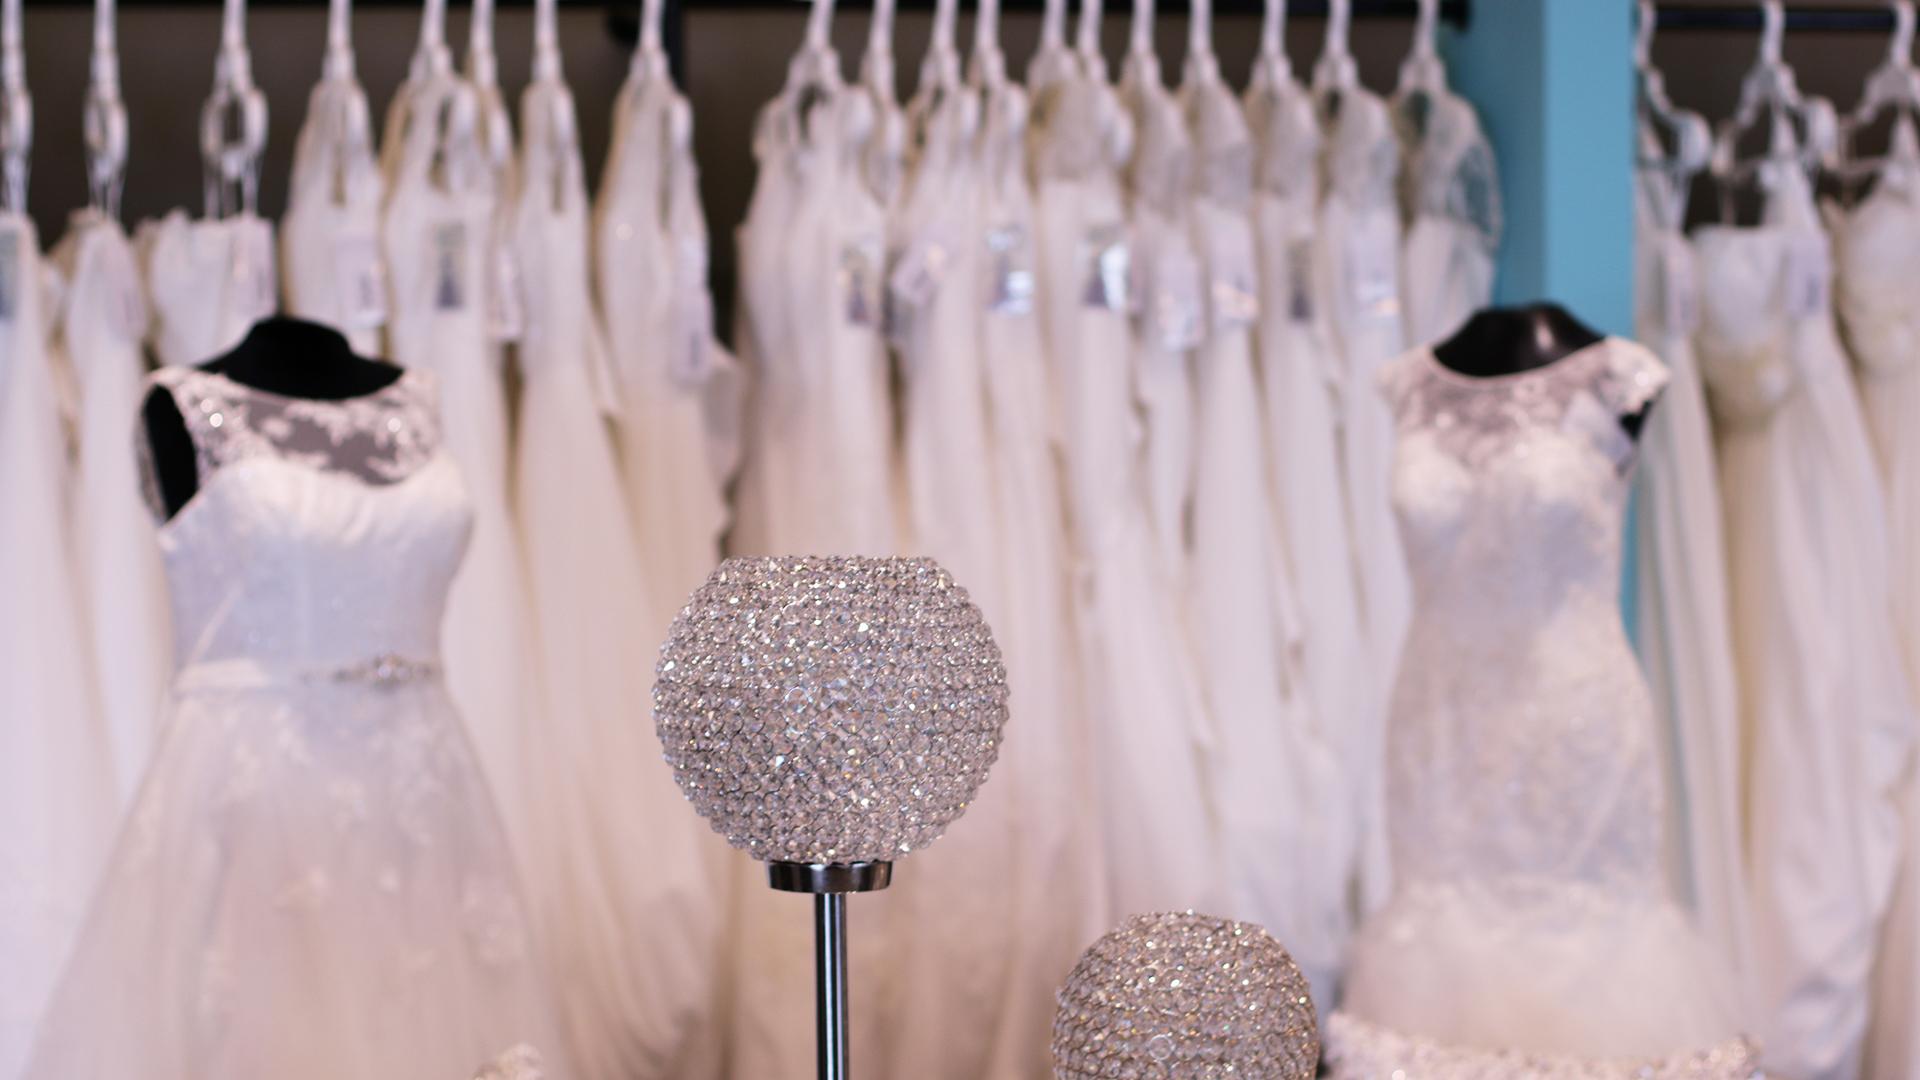 Catan Fashions Announces Grand Opening of New Concept Bridal Salon